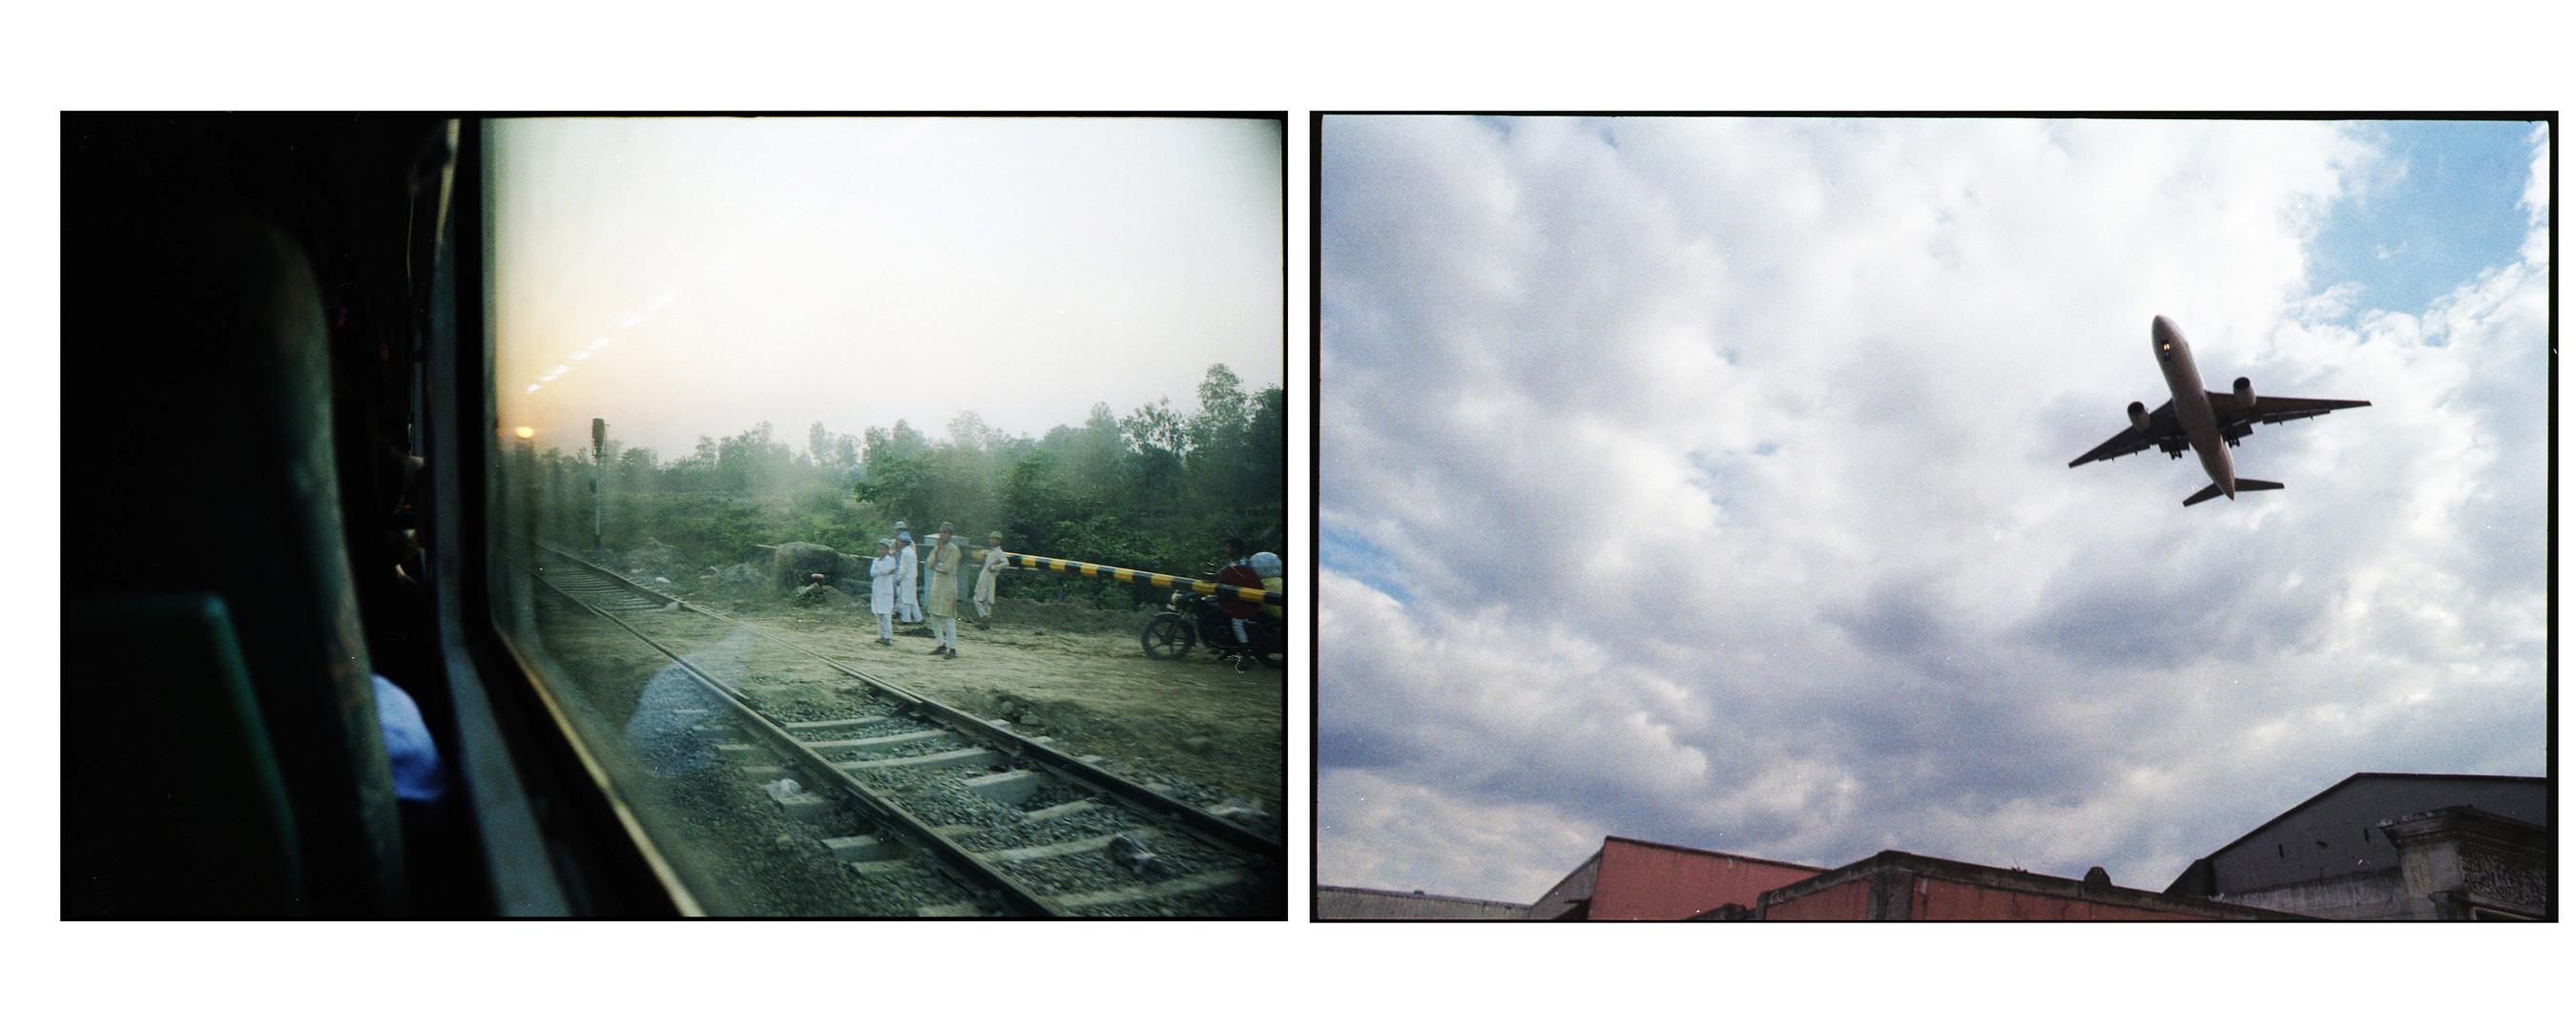 Duo_avion_train.jpg